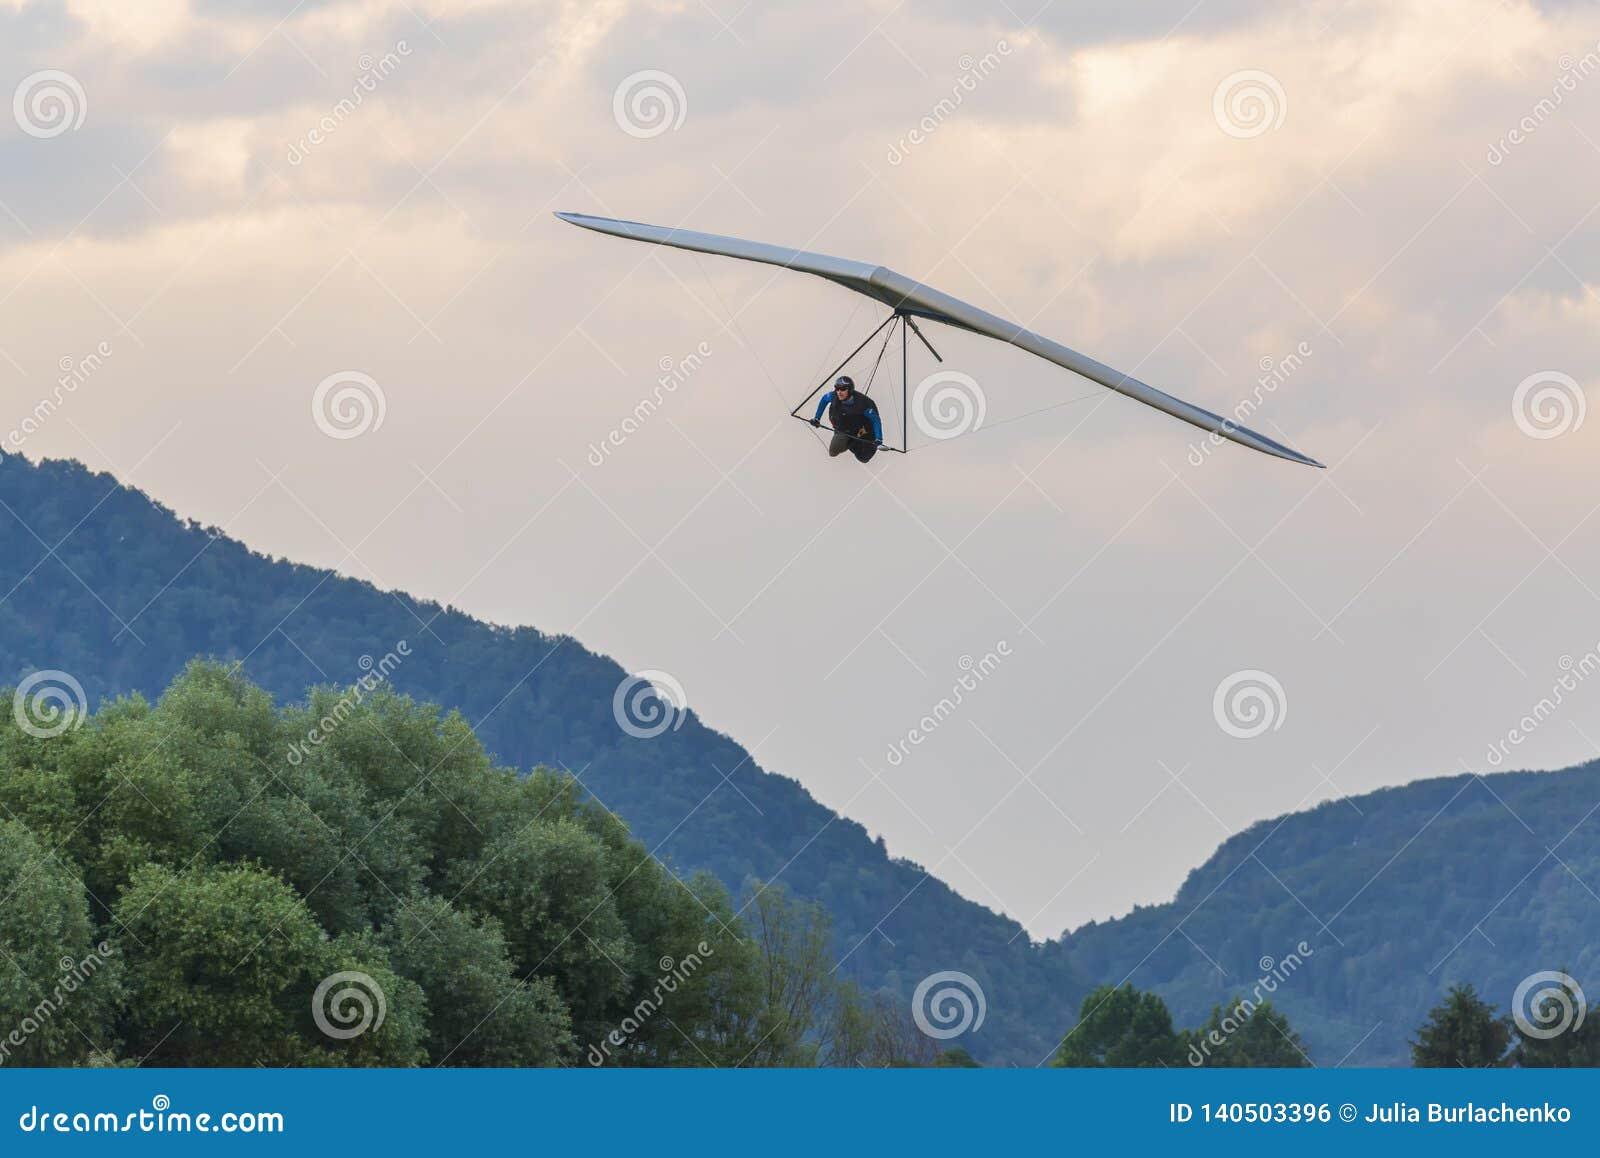 2018-06-30 Tolmin, Slovenia  Hang Glider Pilot Approaches